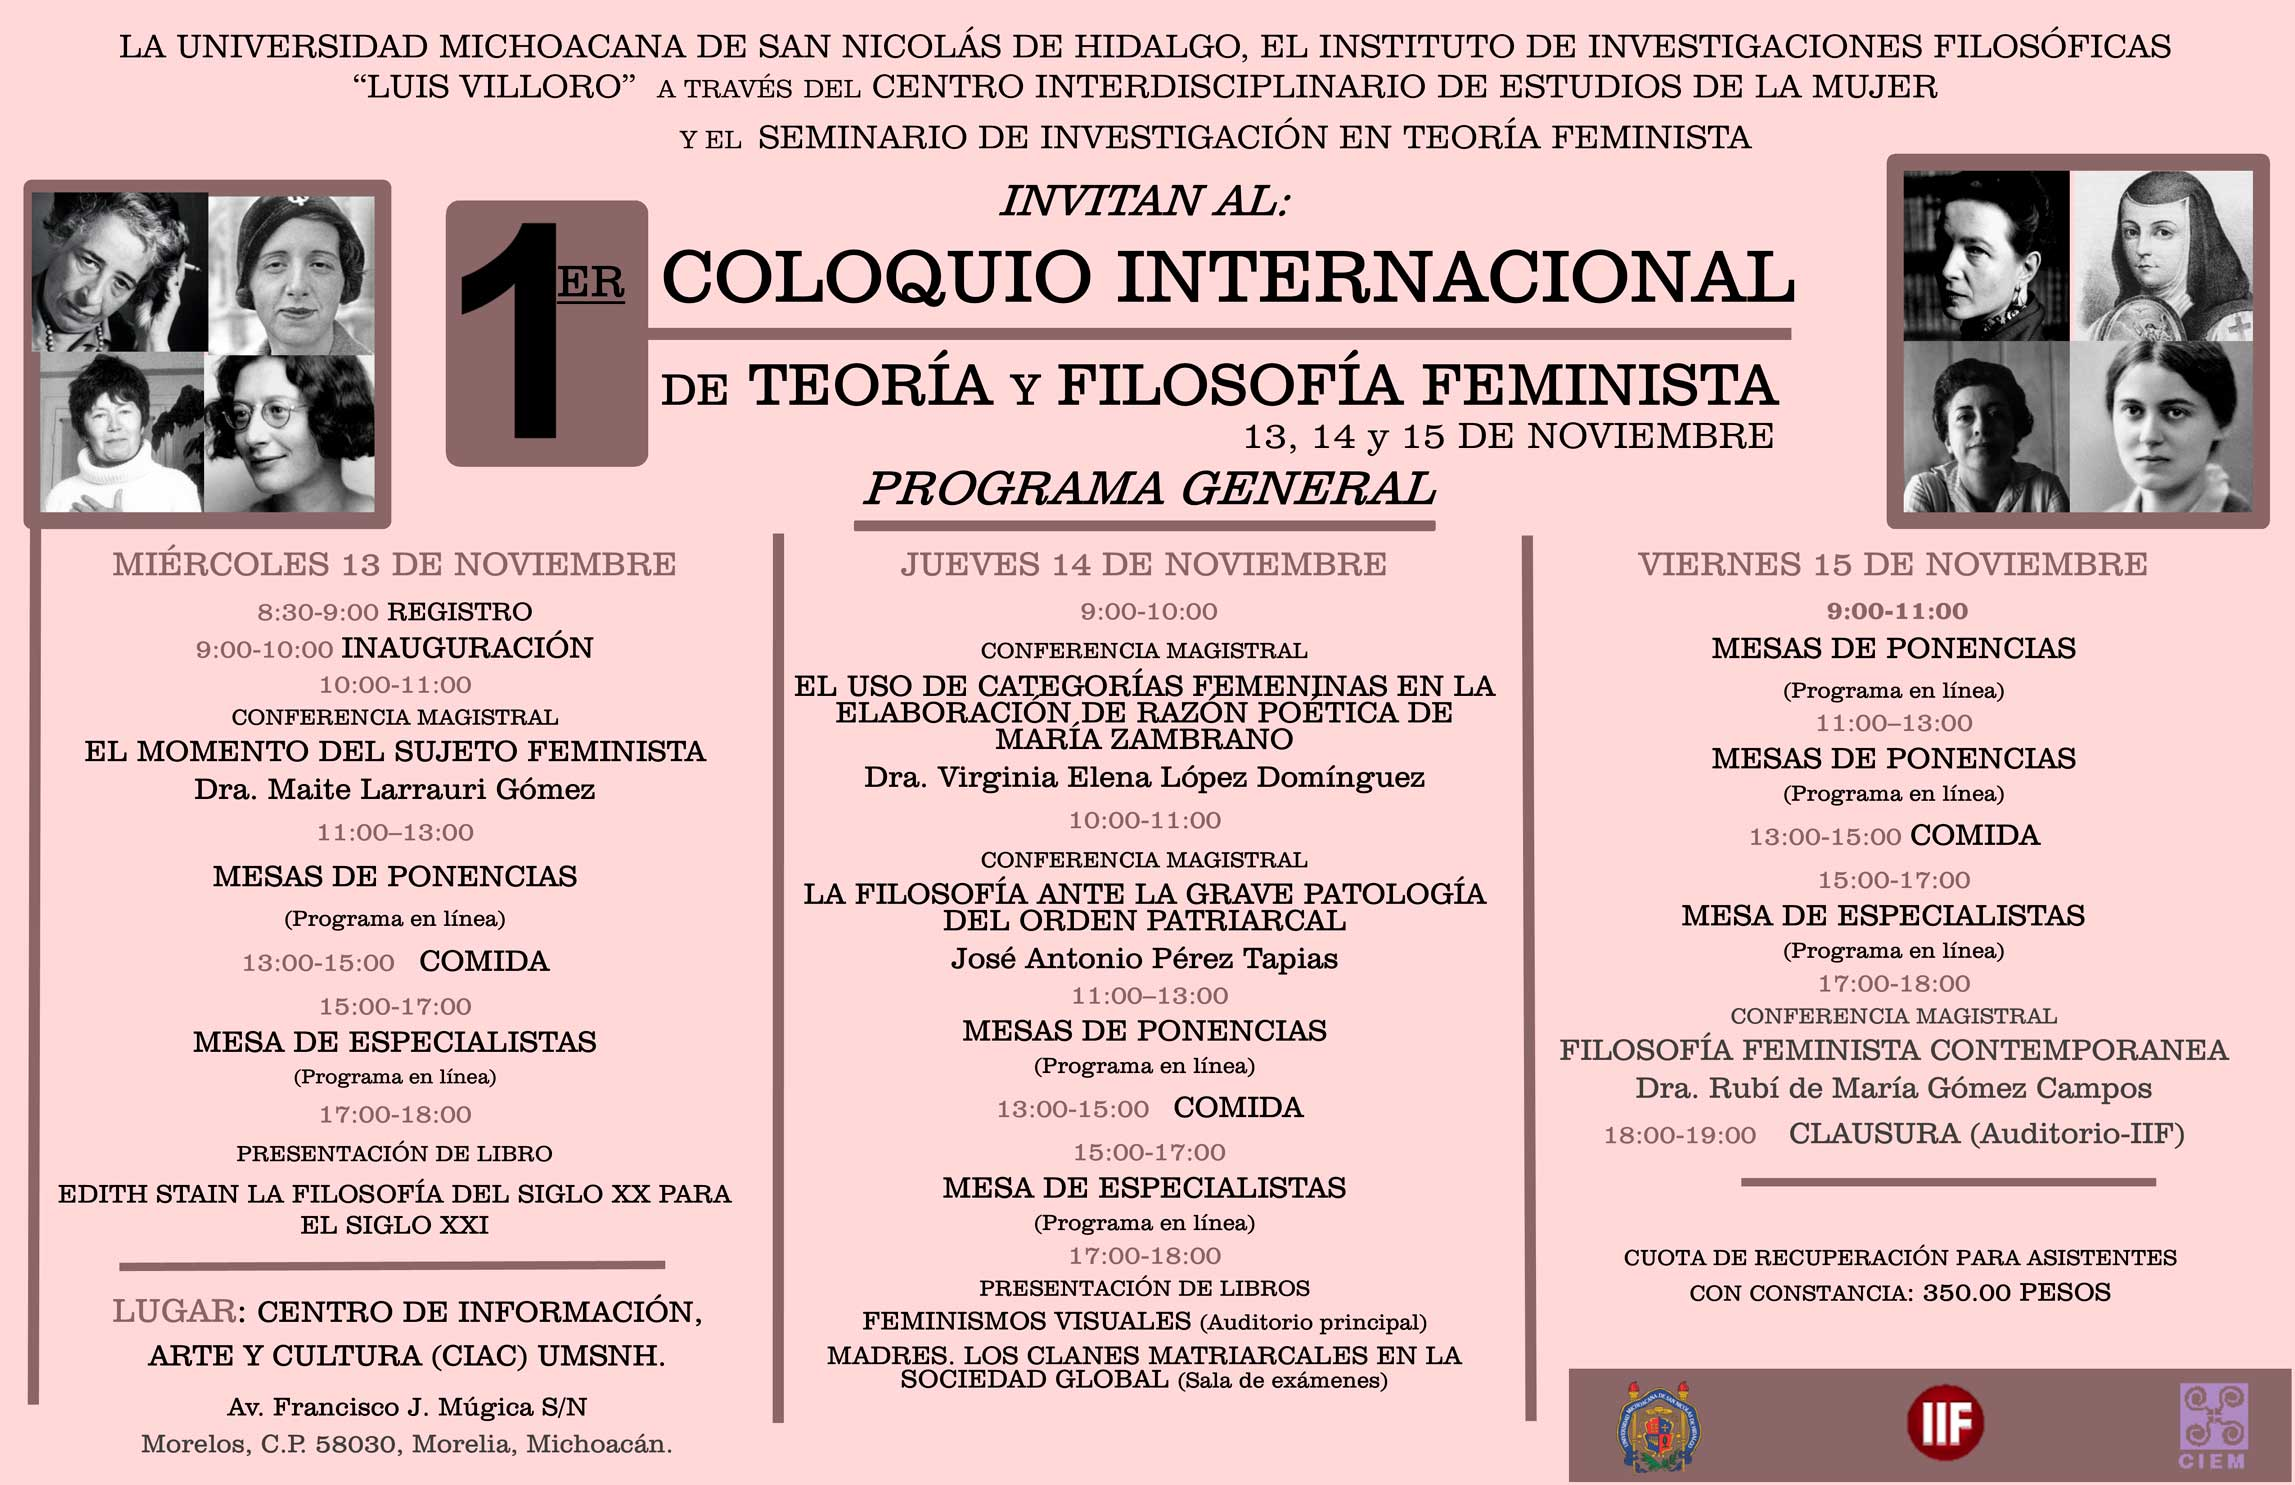 Programa del Primer Coloquio Internacional en Filosofía Feminista